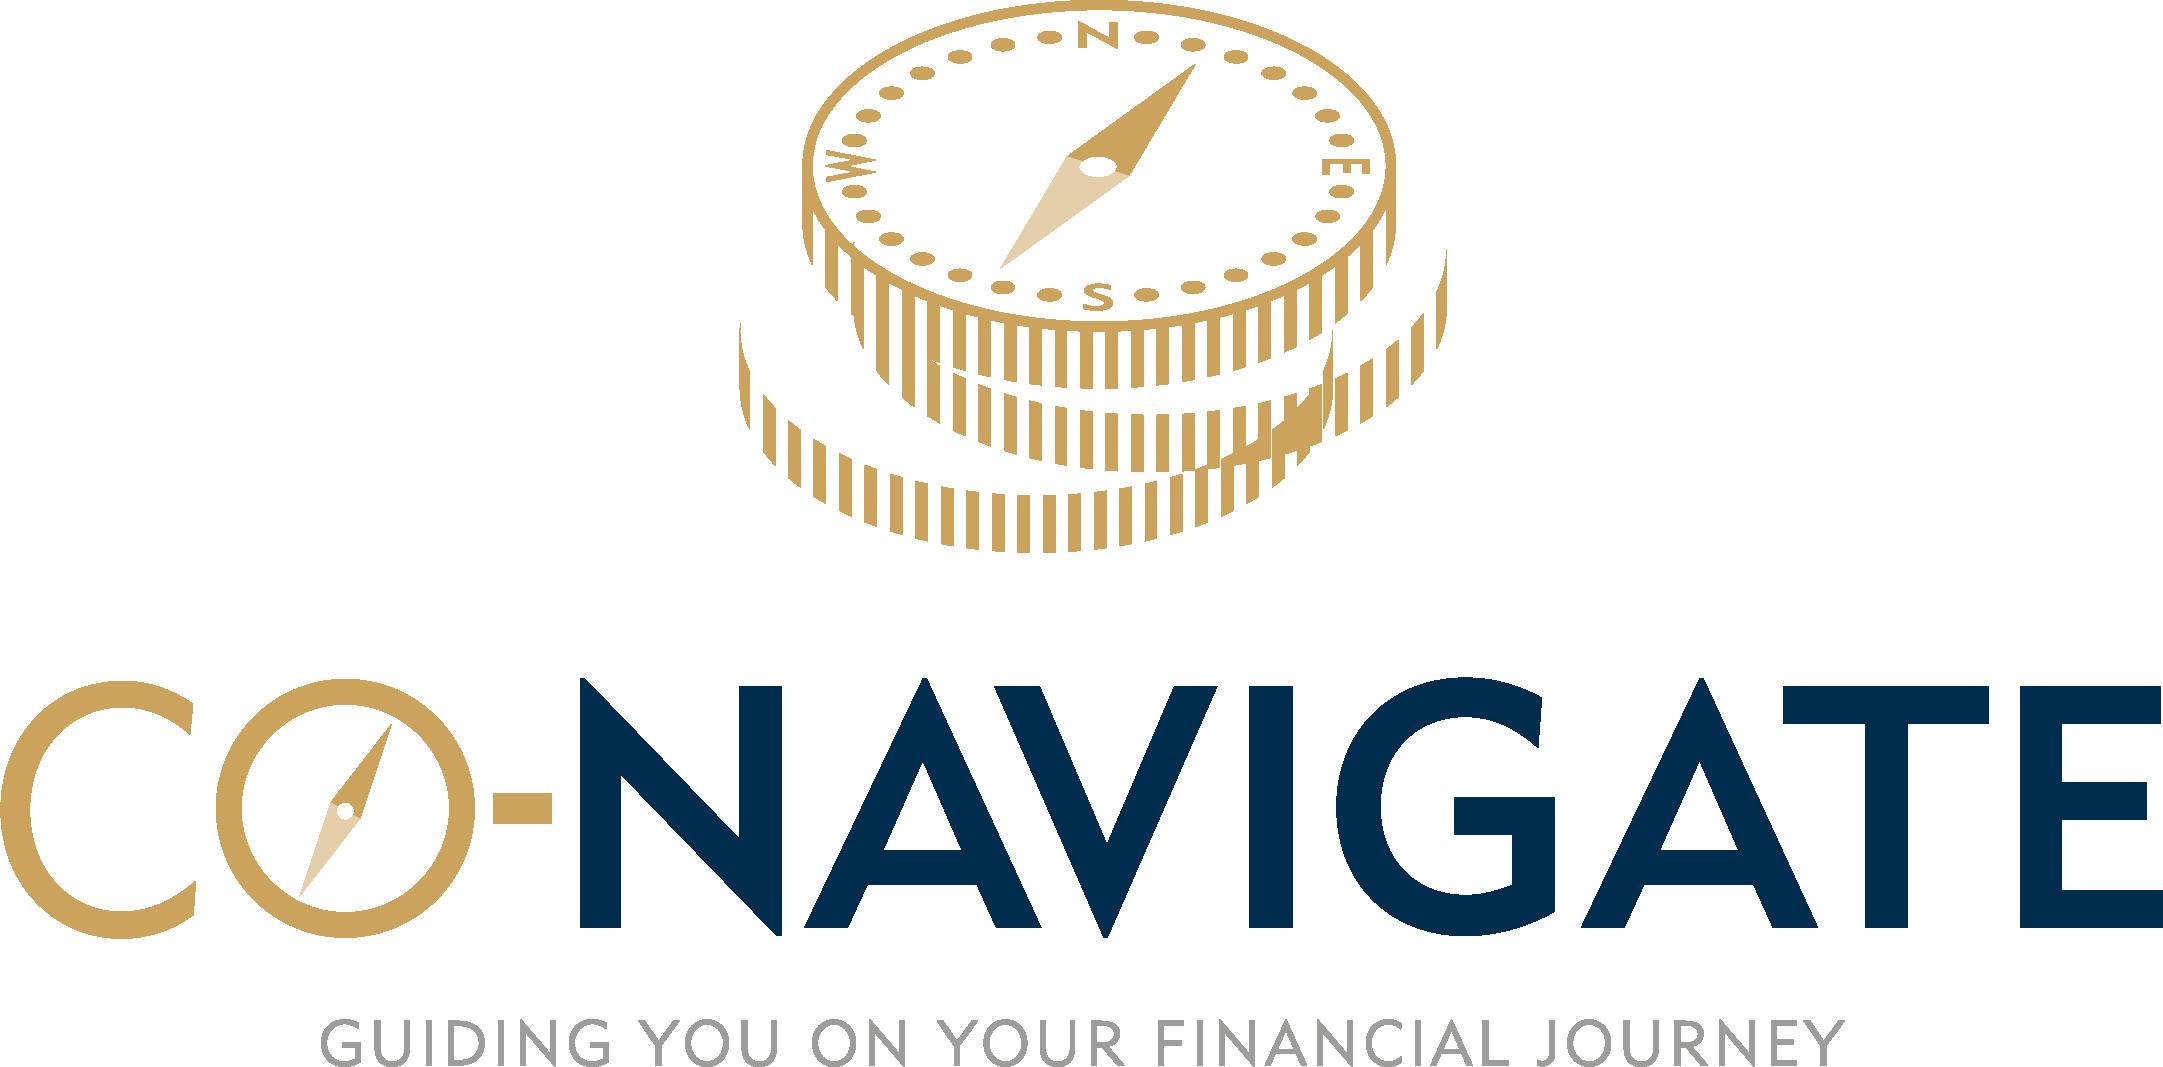 CoNavigate Logo